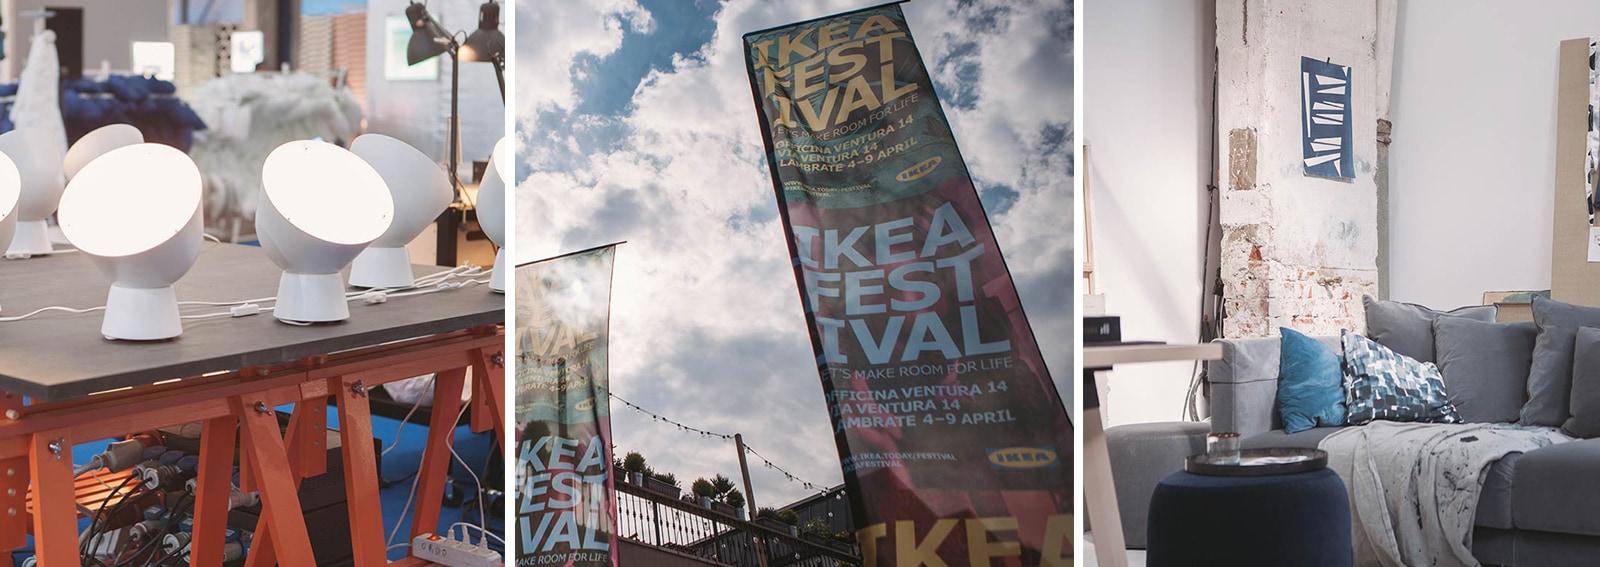 cover-ikea-festival-desktop